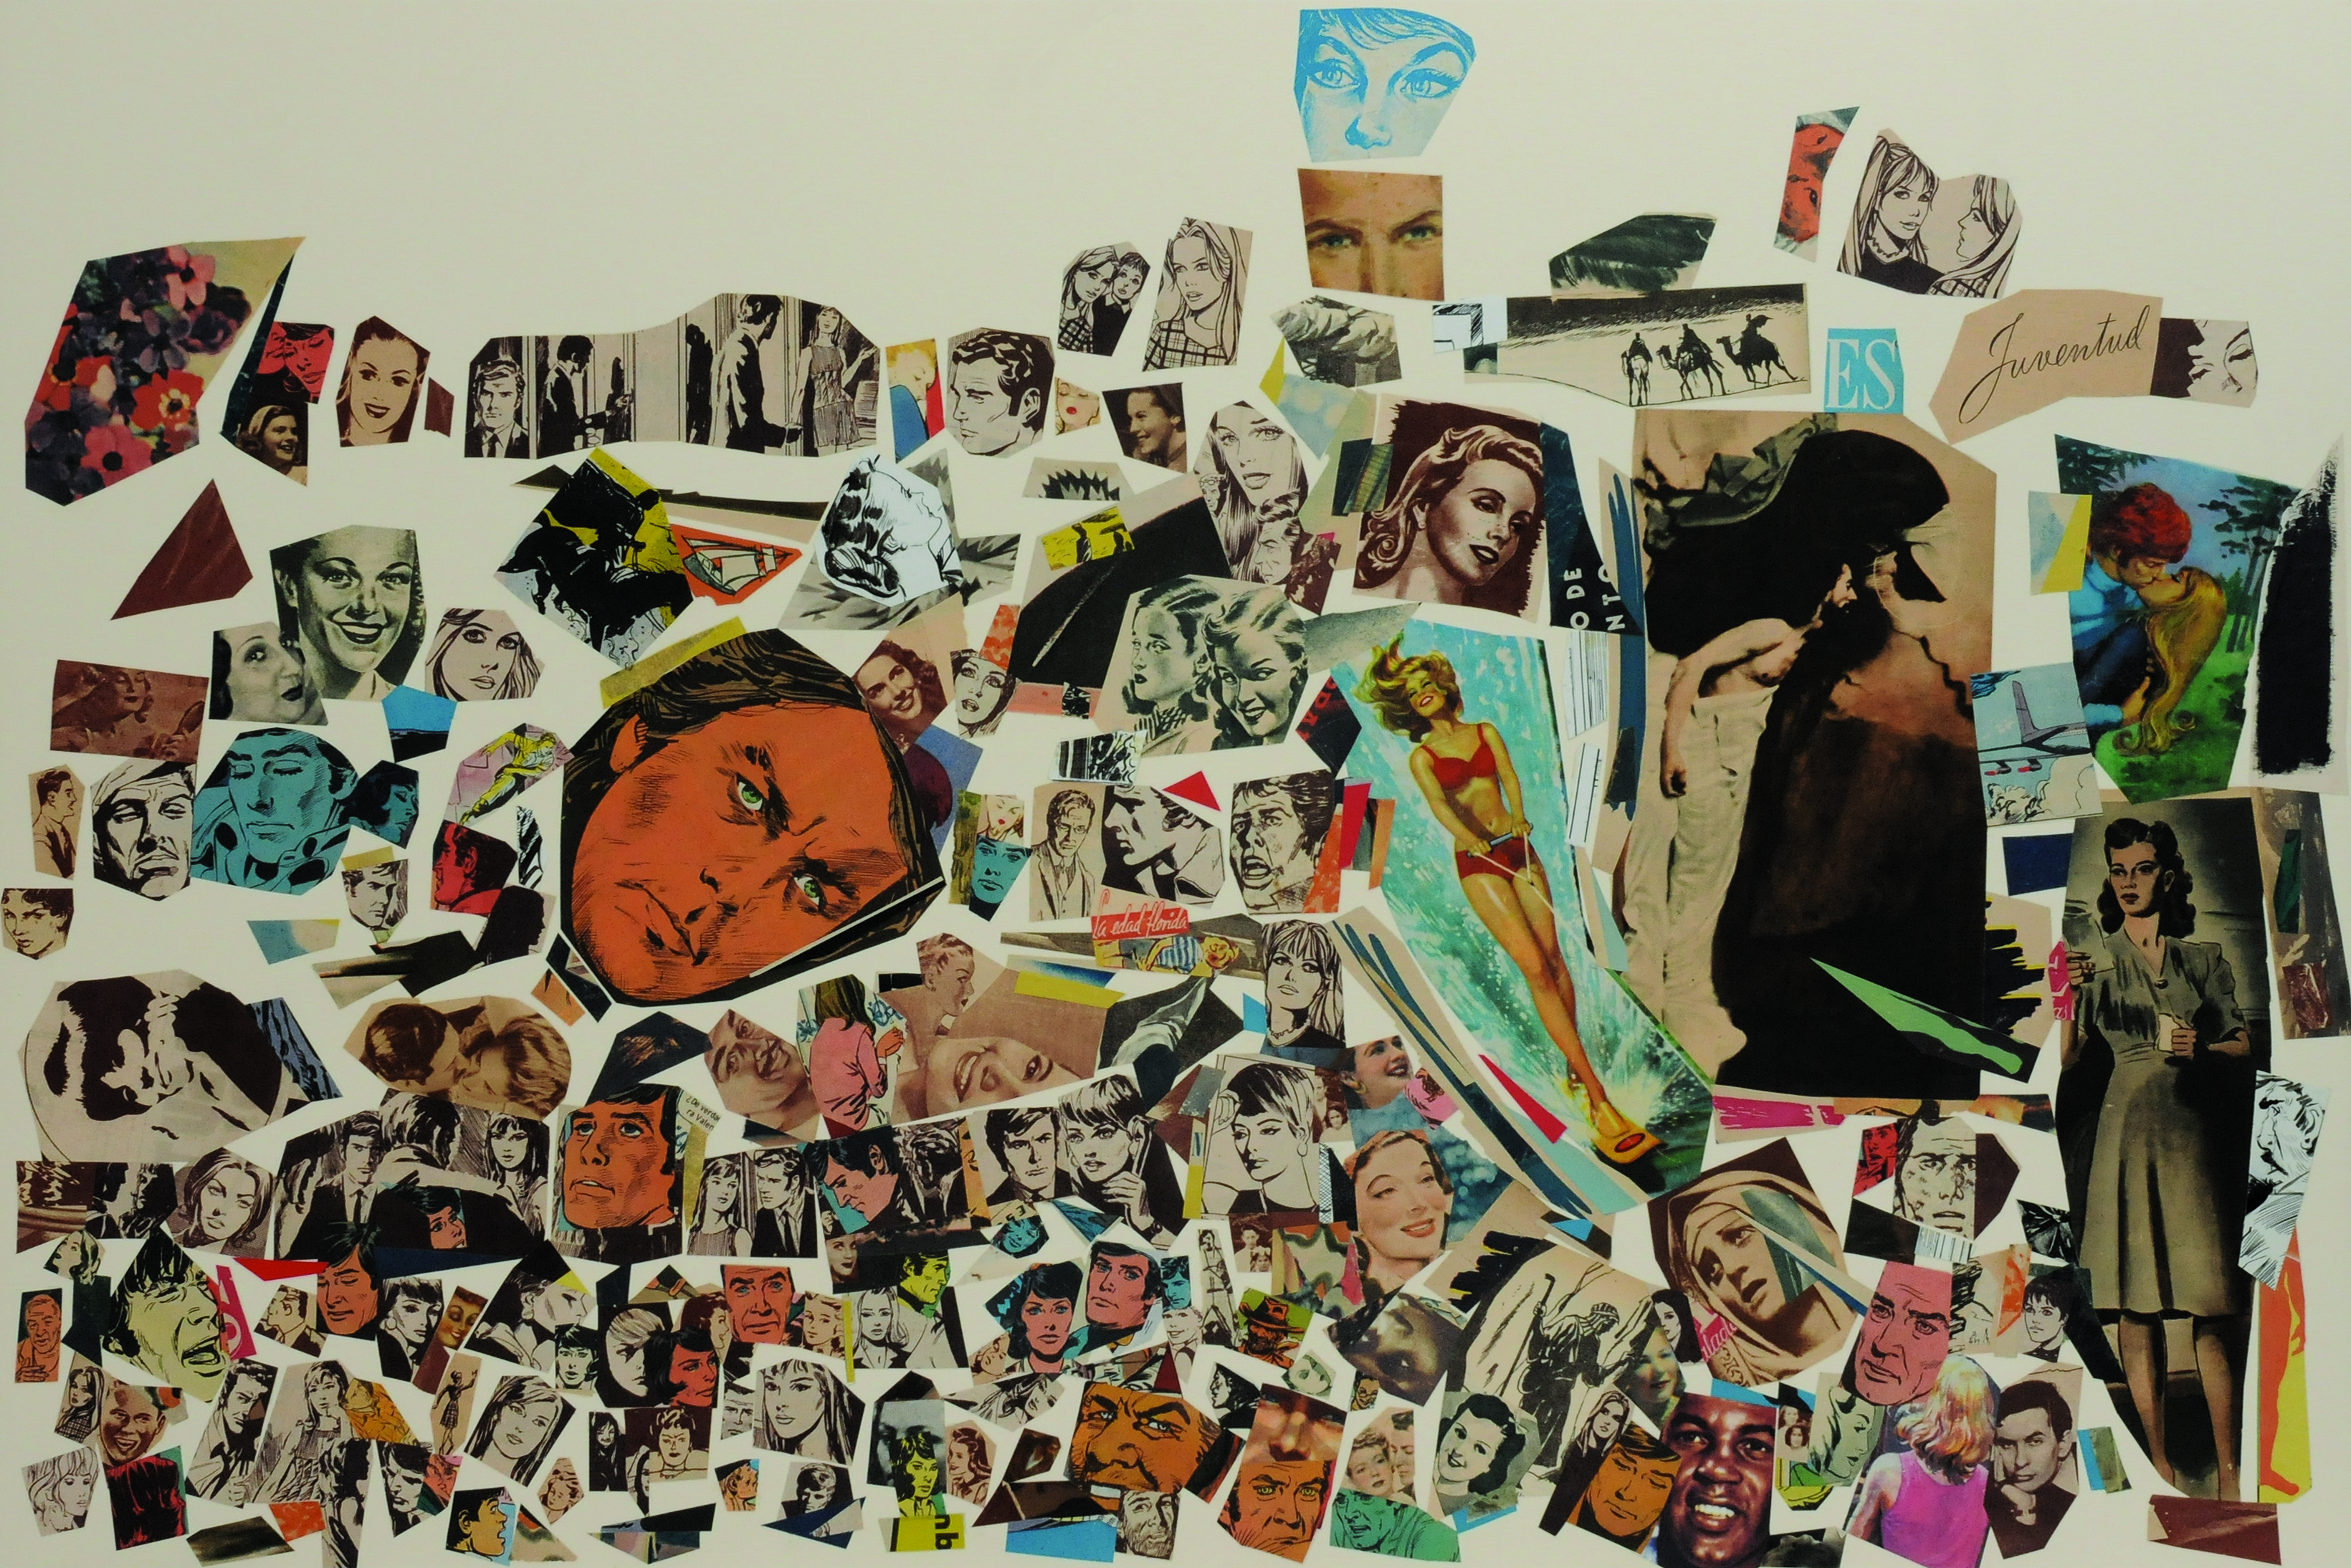 Juventud, papel collage, 51 cm x 76 cm. 2008